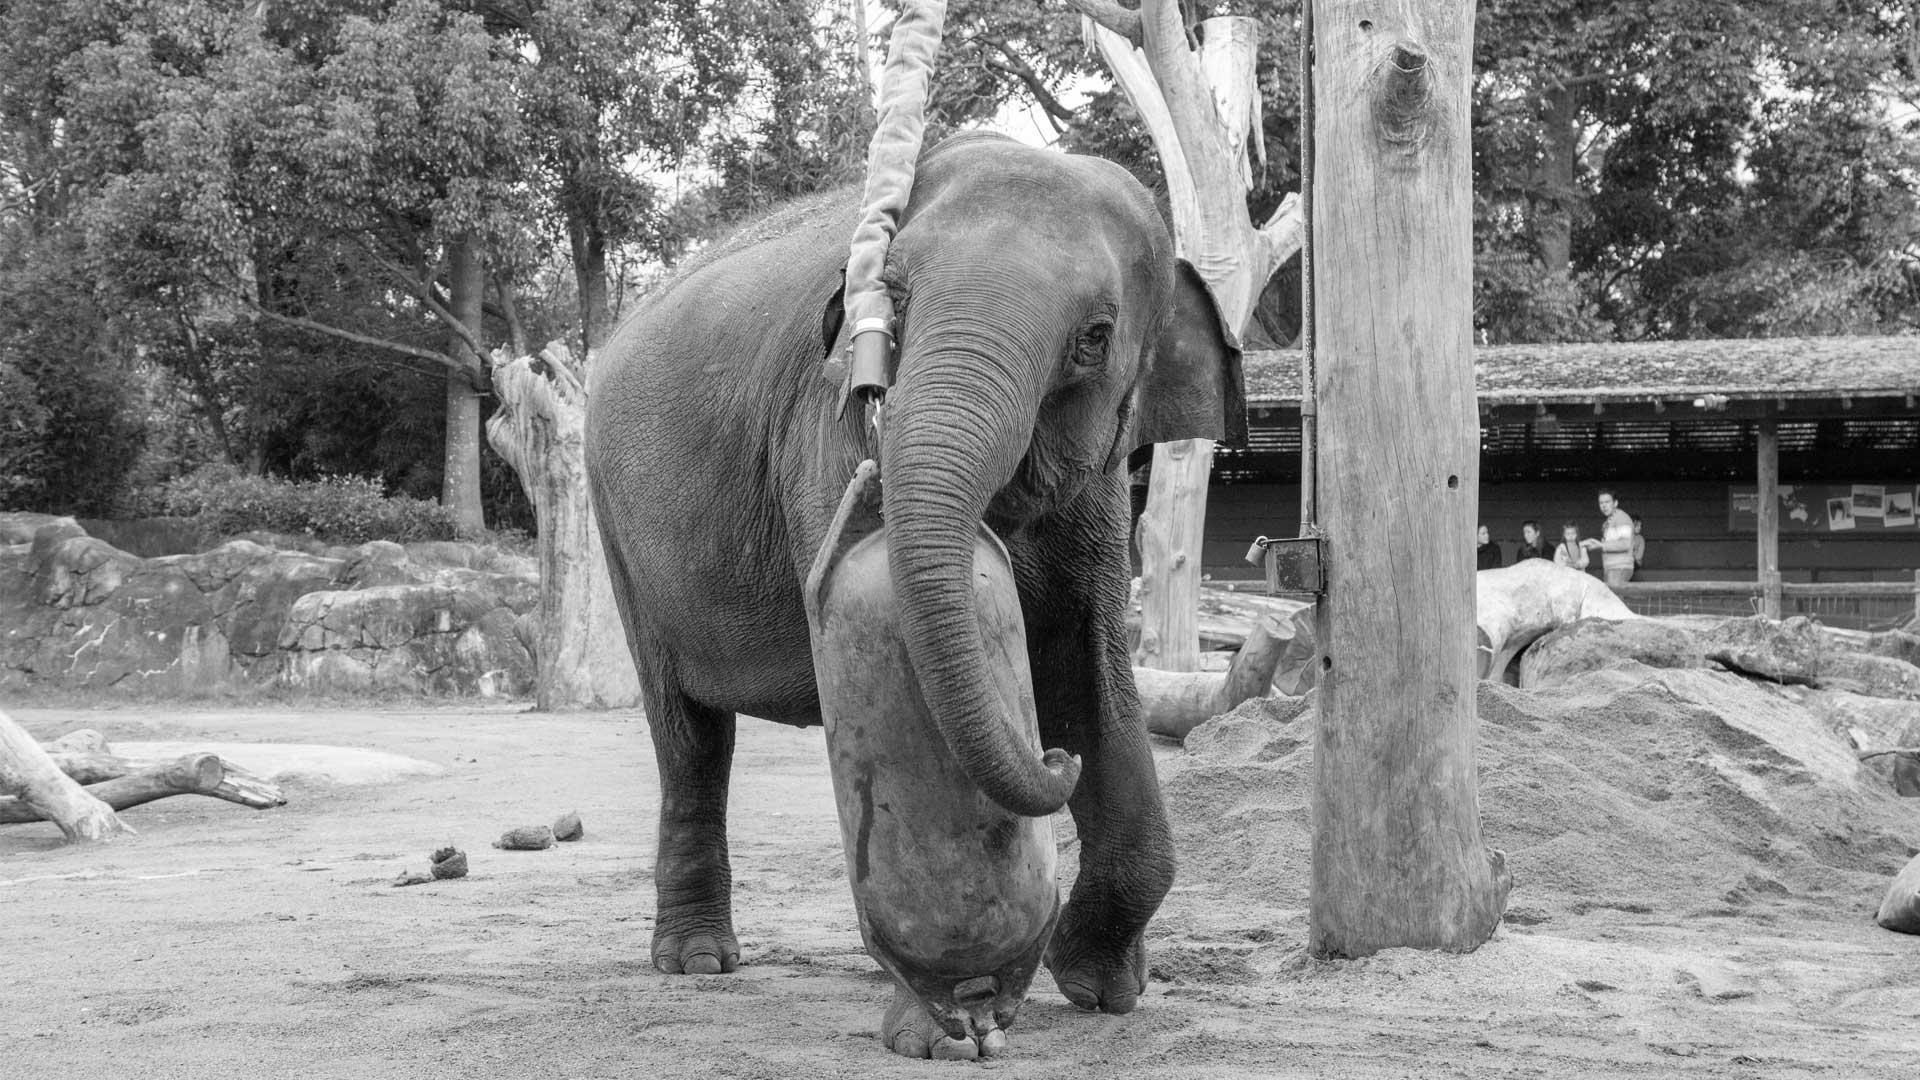 https://rfacdn.nz/zoo/assets/media/world-elephant-day-gallery-12.jpg